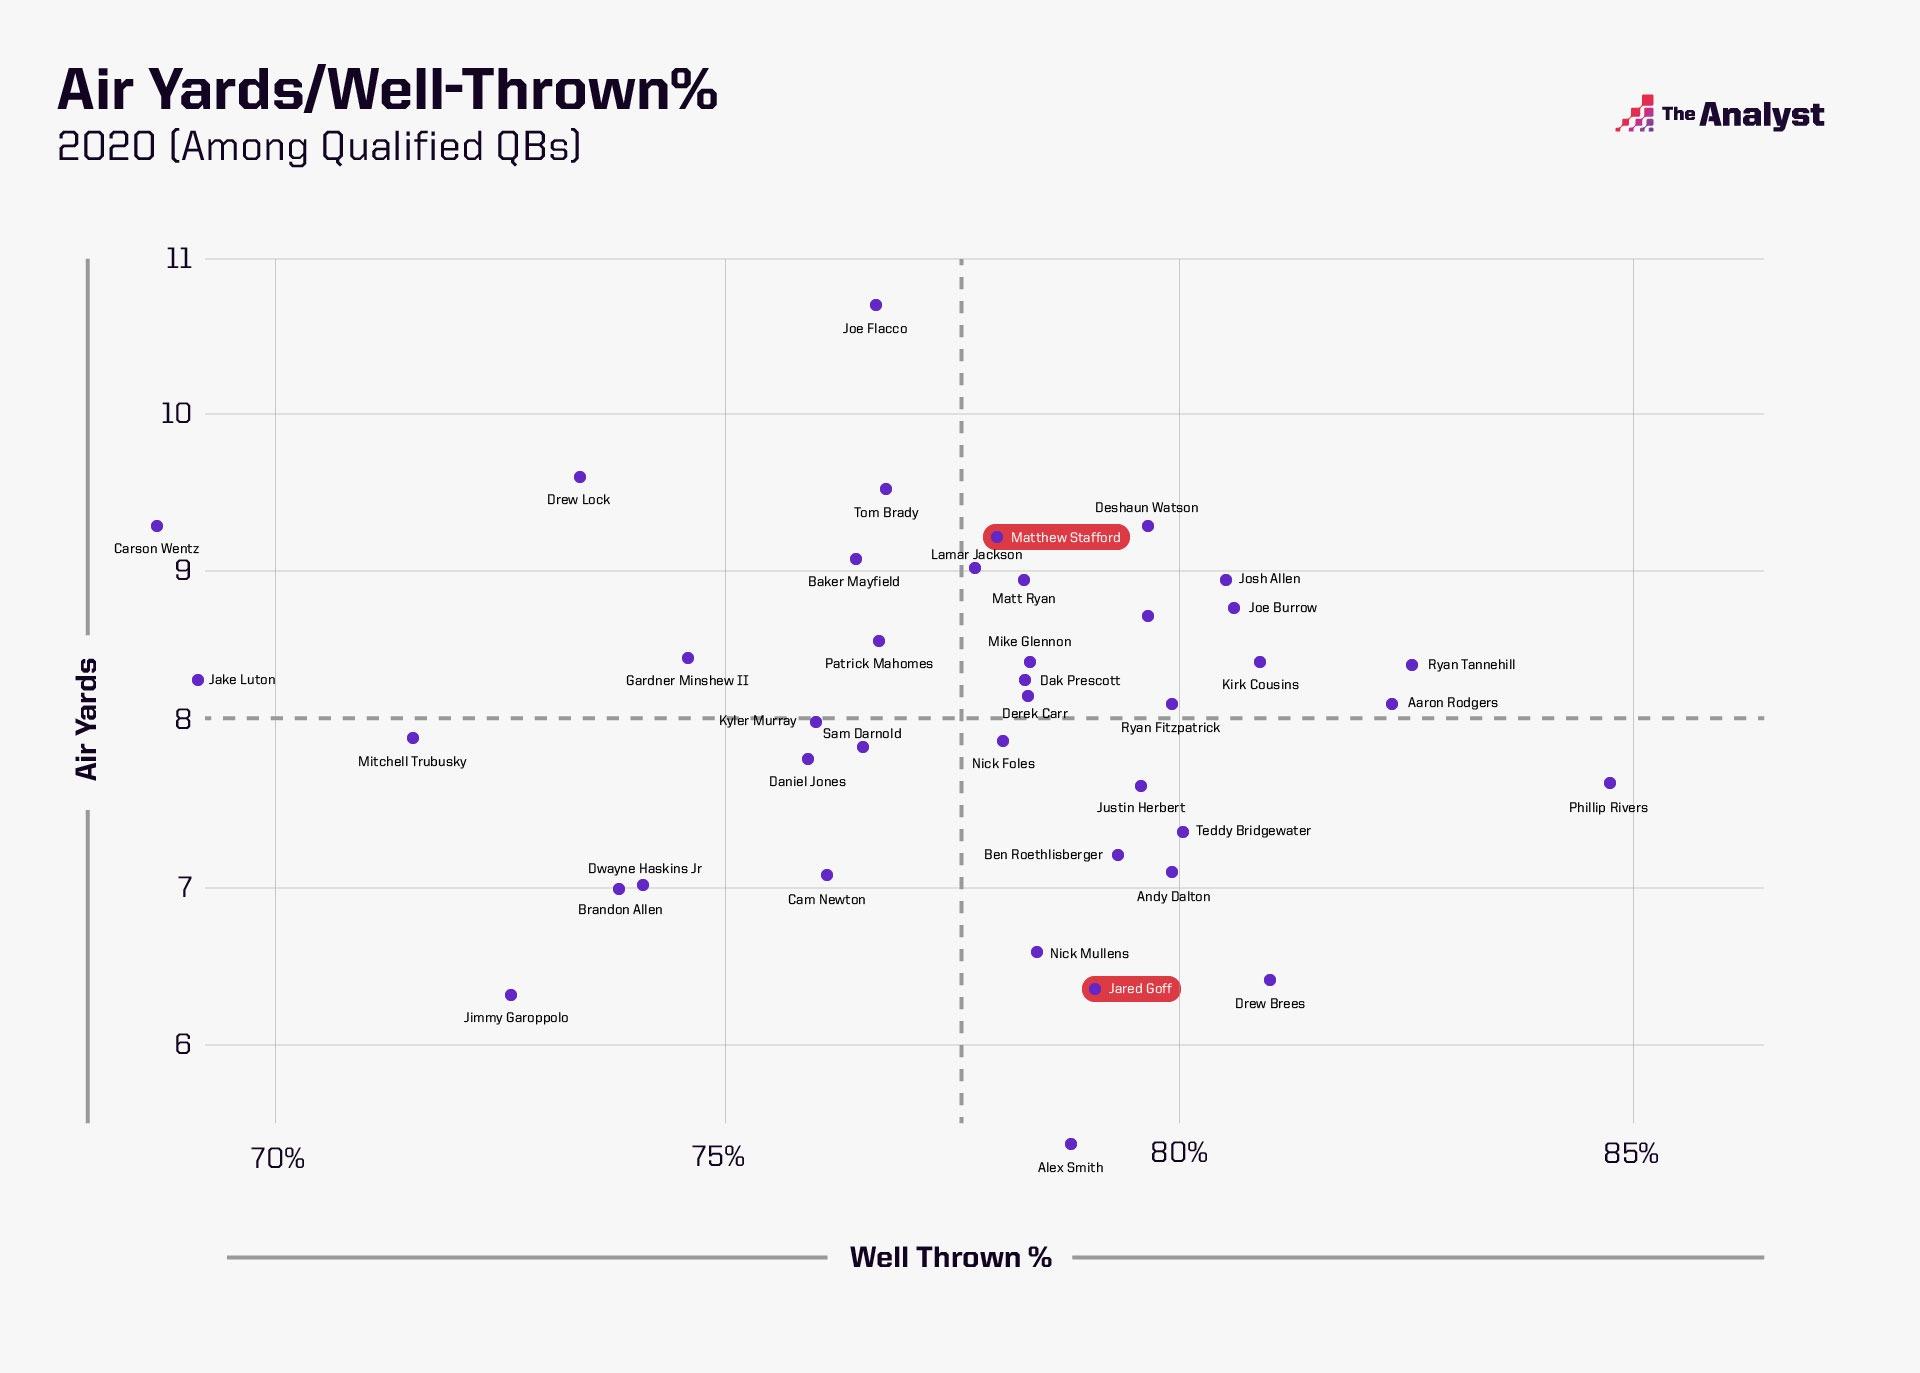 air yards/well-thrown quadrant analysis